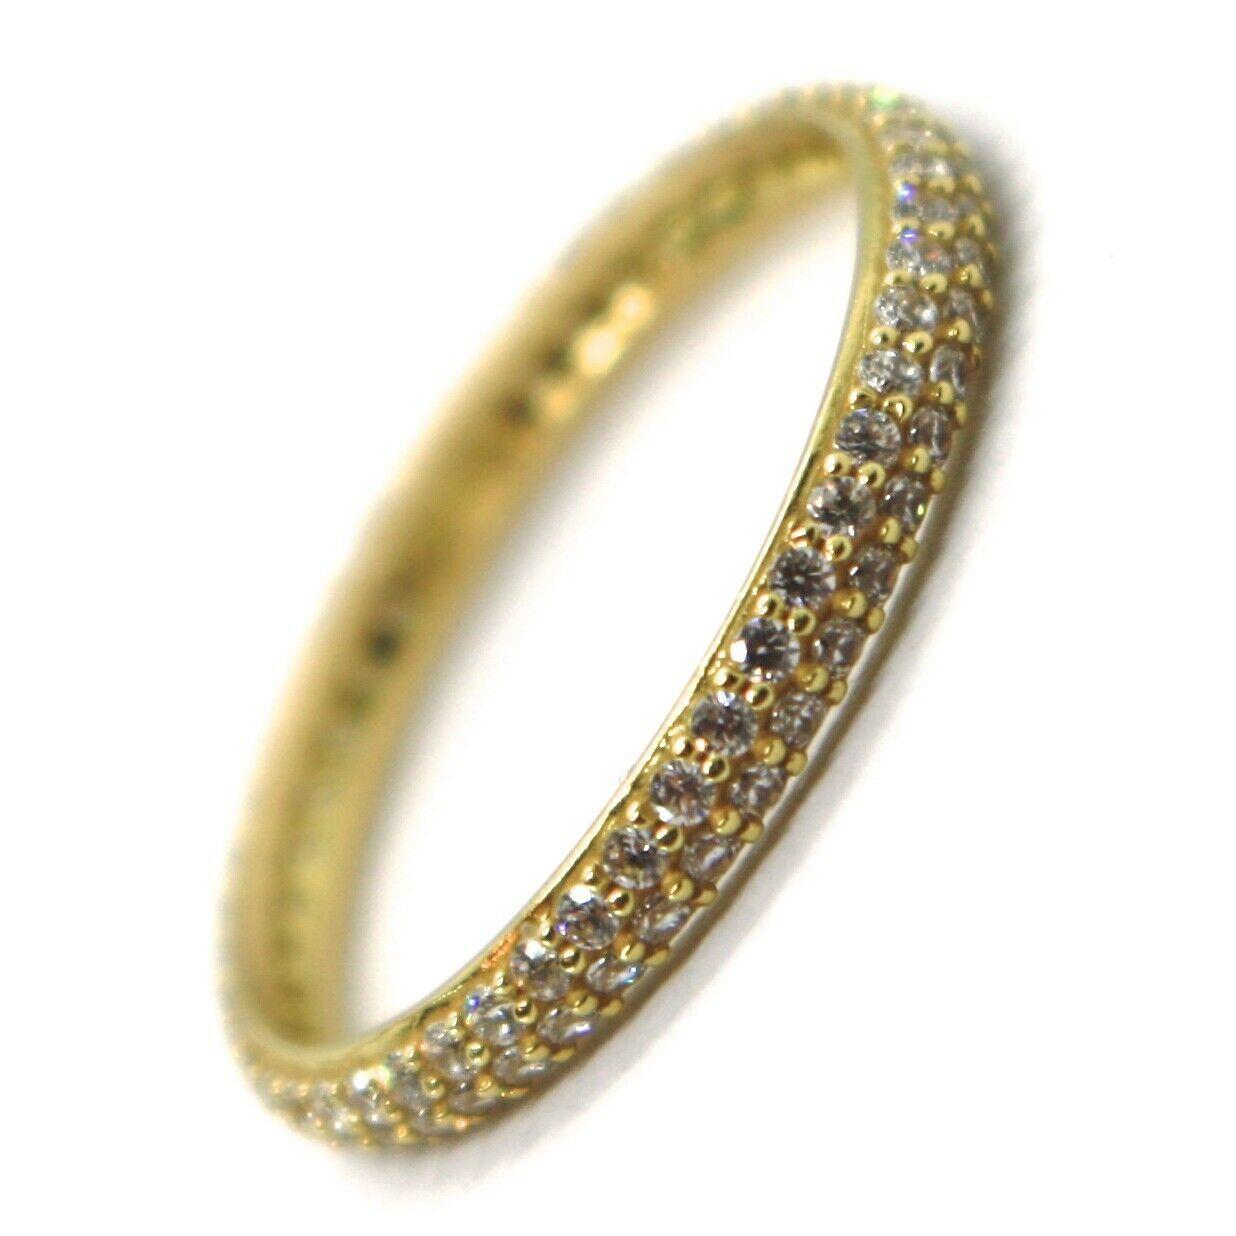 Yellow Gold Ring 750 18K, Eternity, 2.5 MM, Double Row, Zircon Cubic